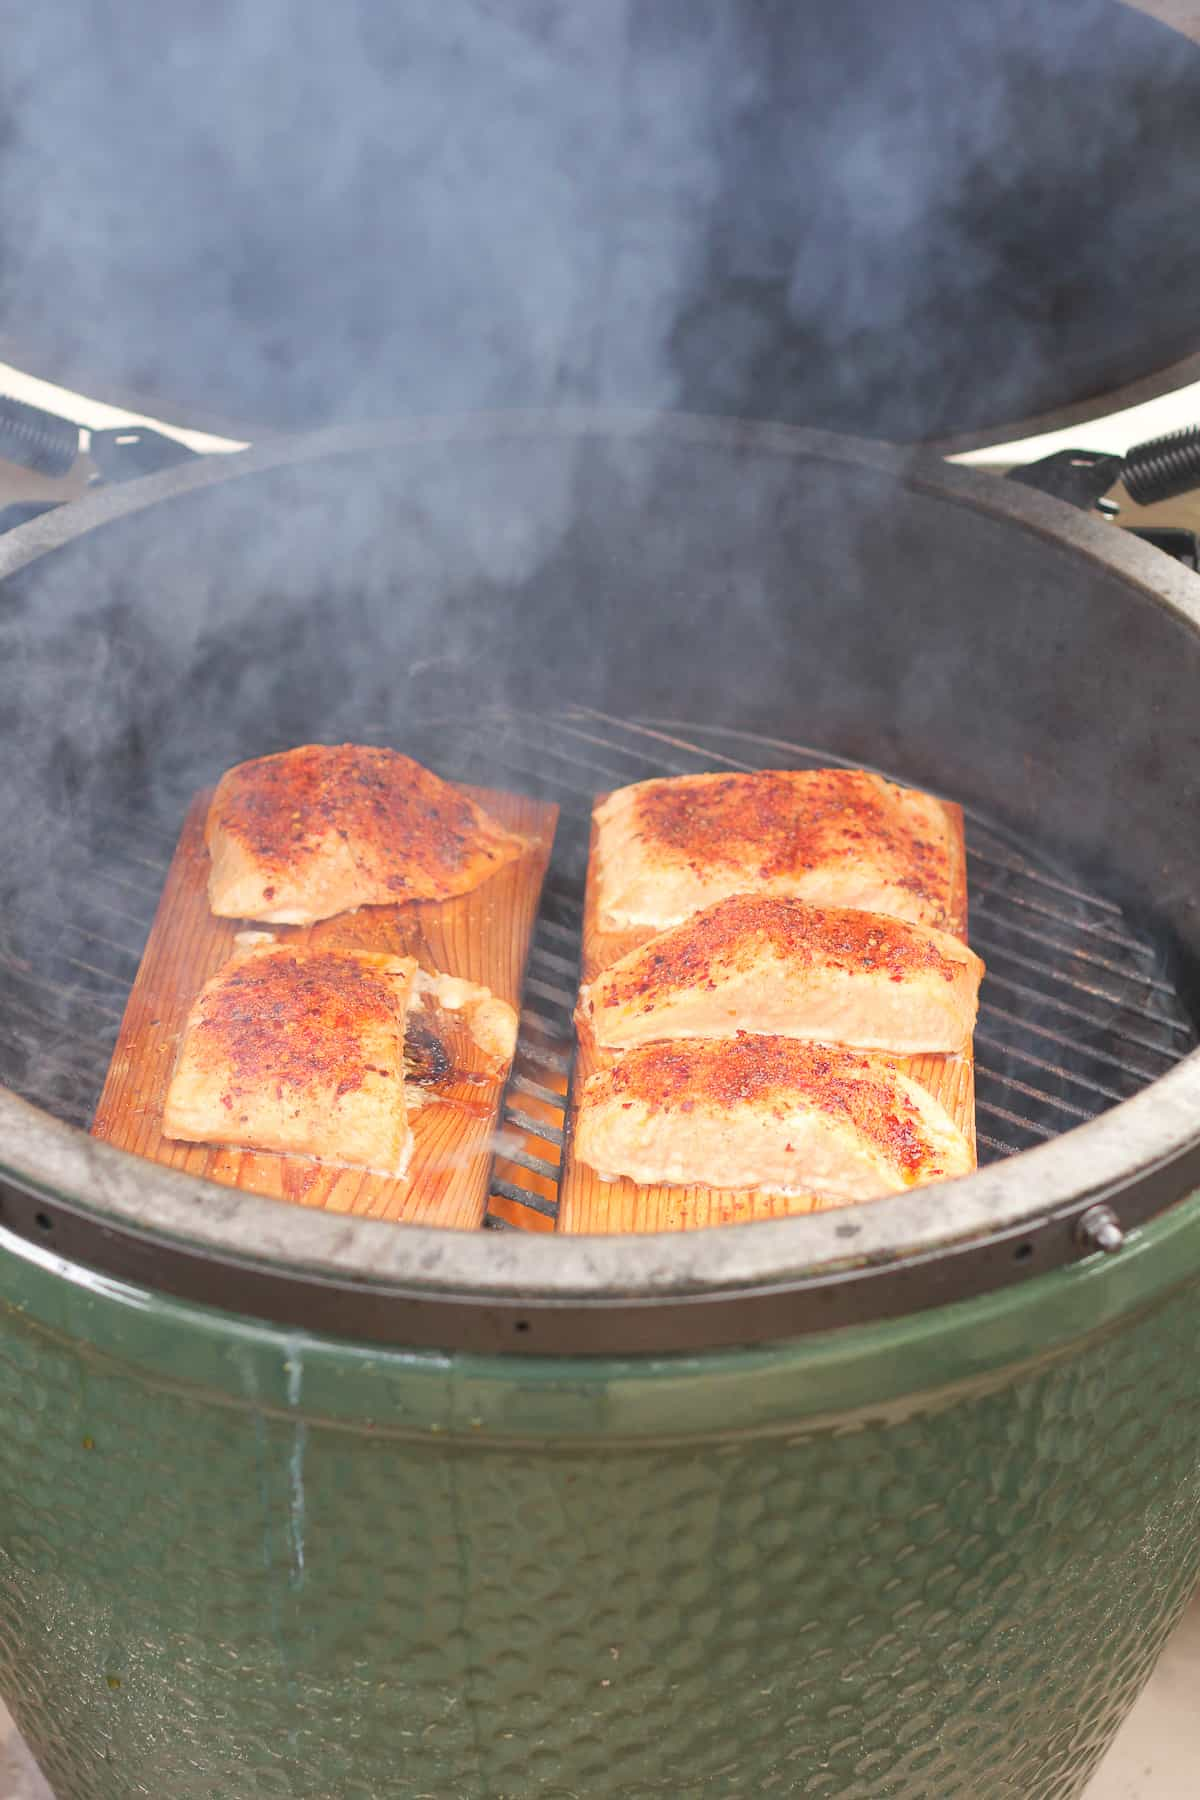 Side shot of a BGE with cedar plank salmon.